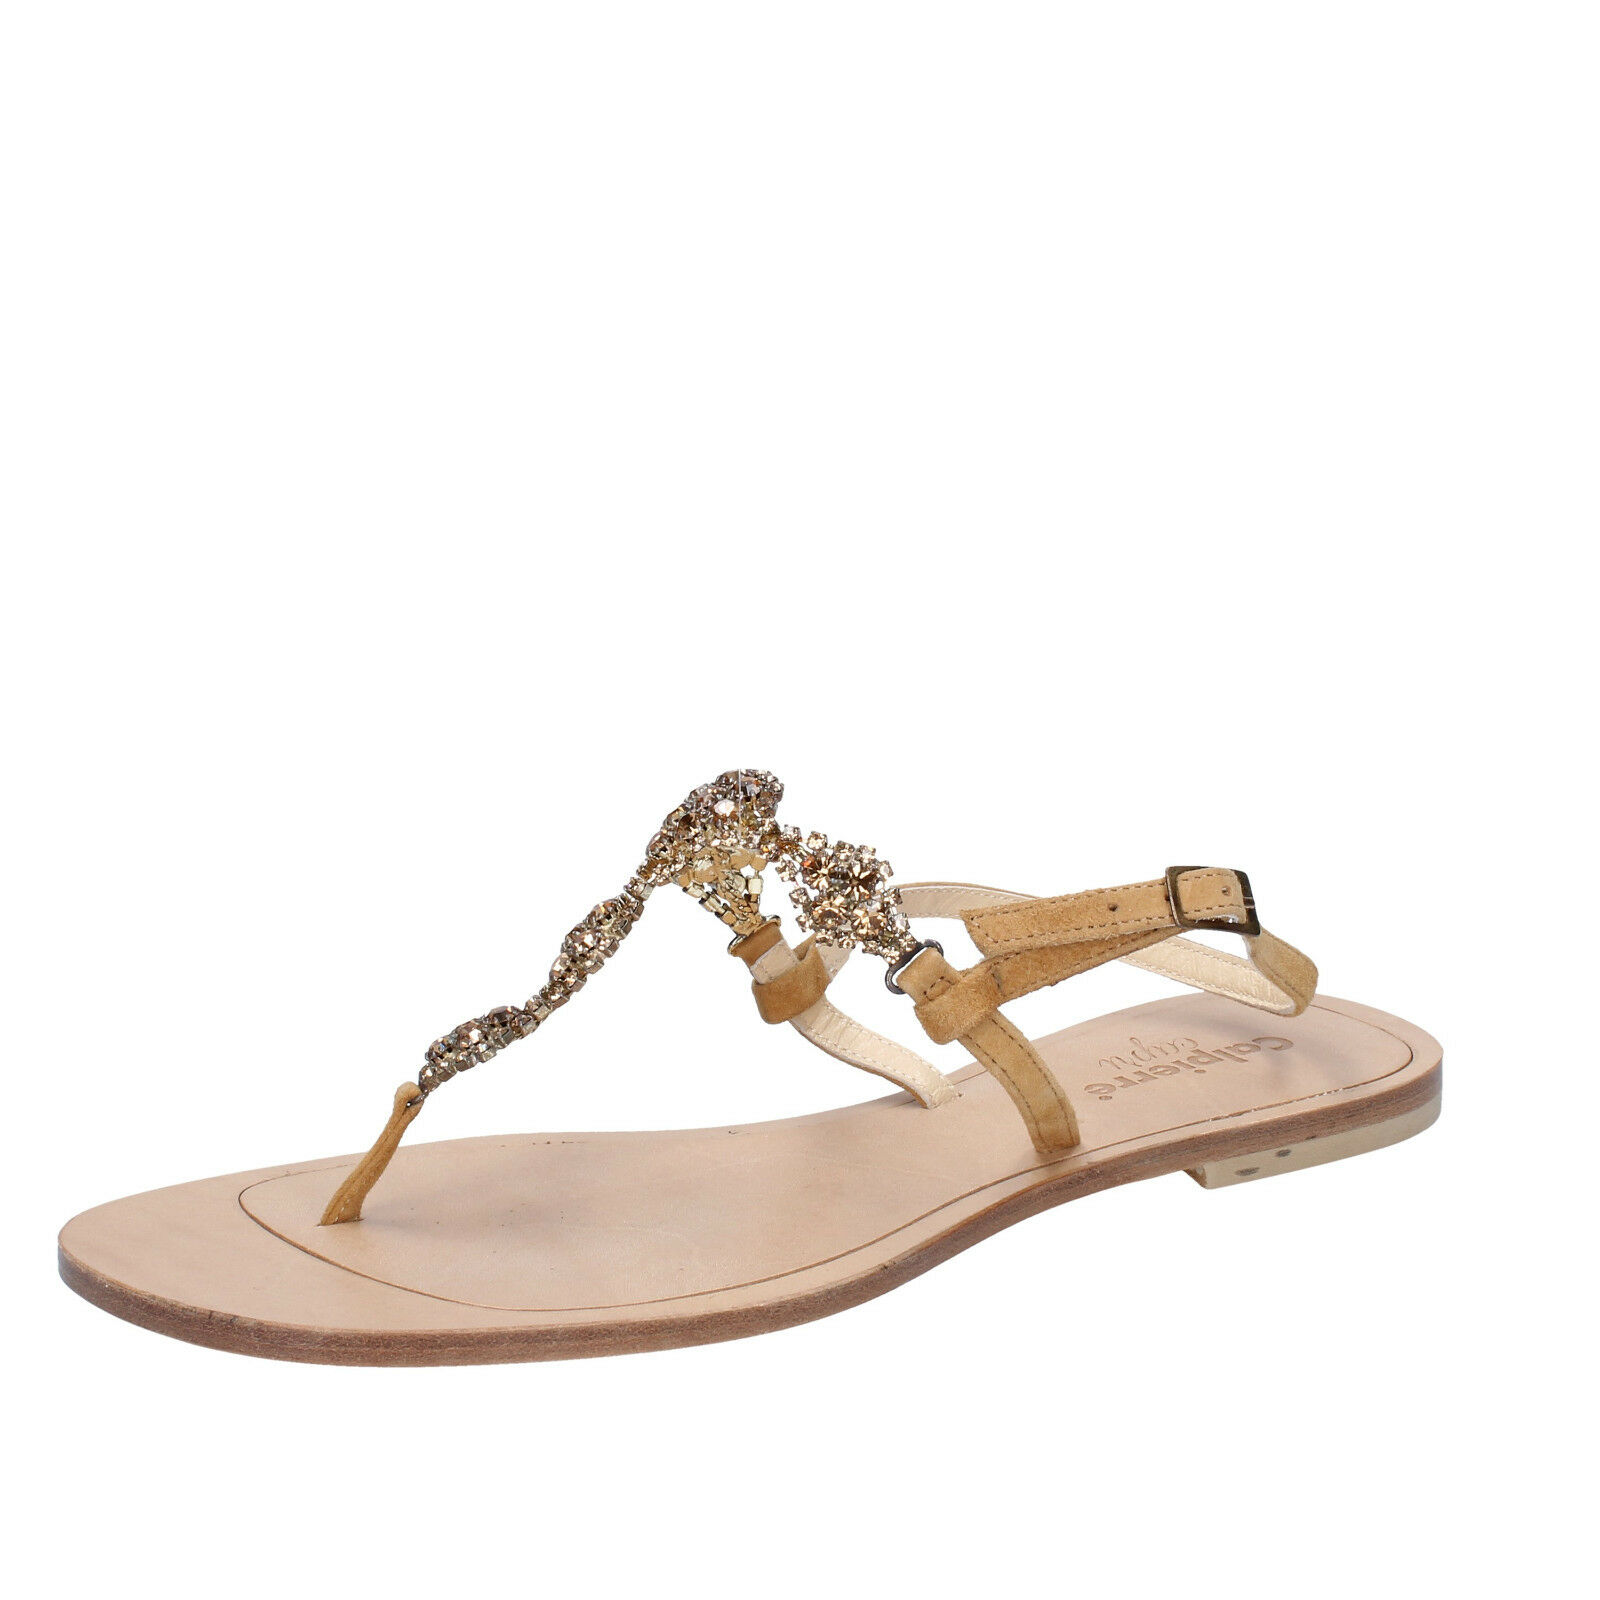 Scarpe donna CALPIERRE 40 EU sandali Marroneee camoscio BZ876